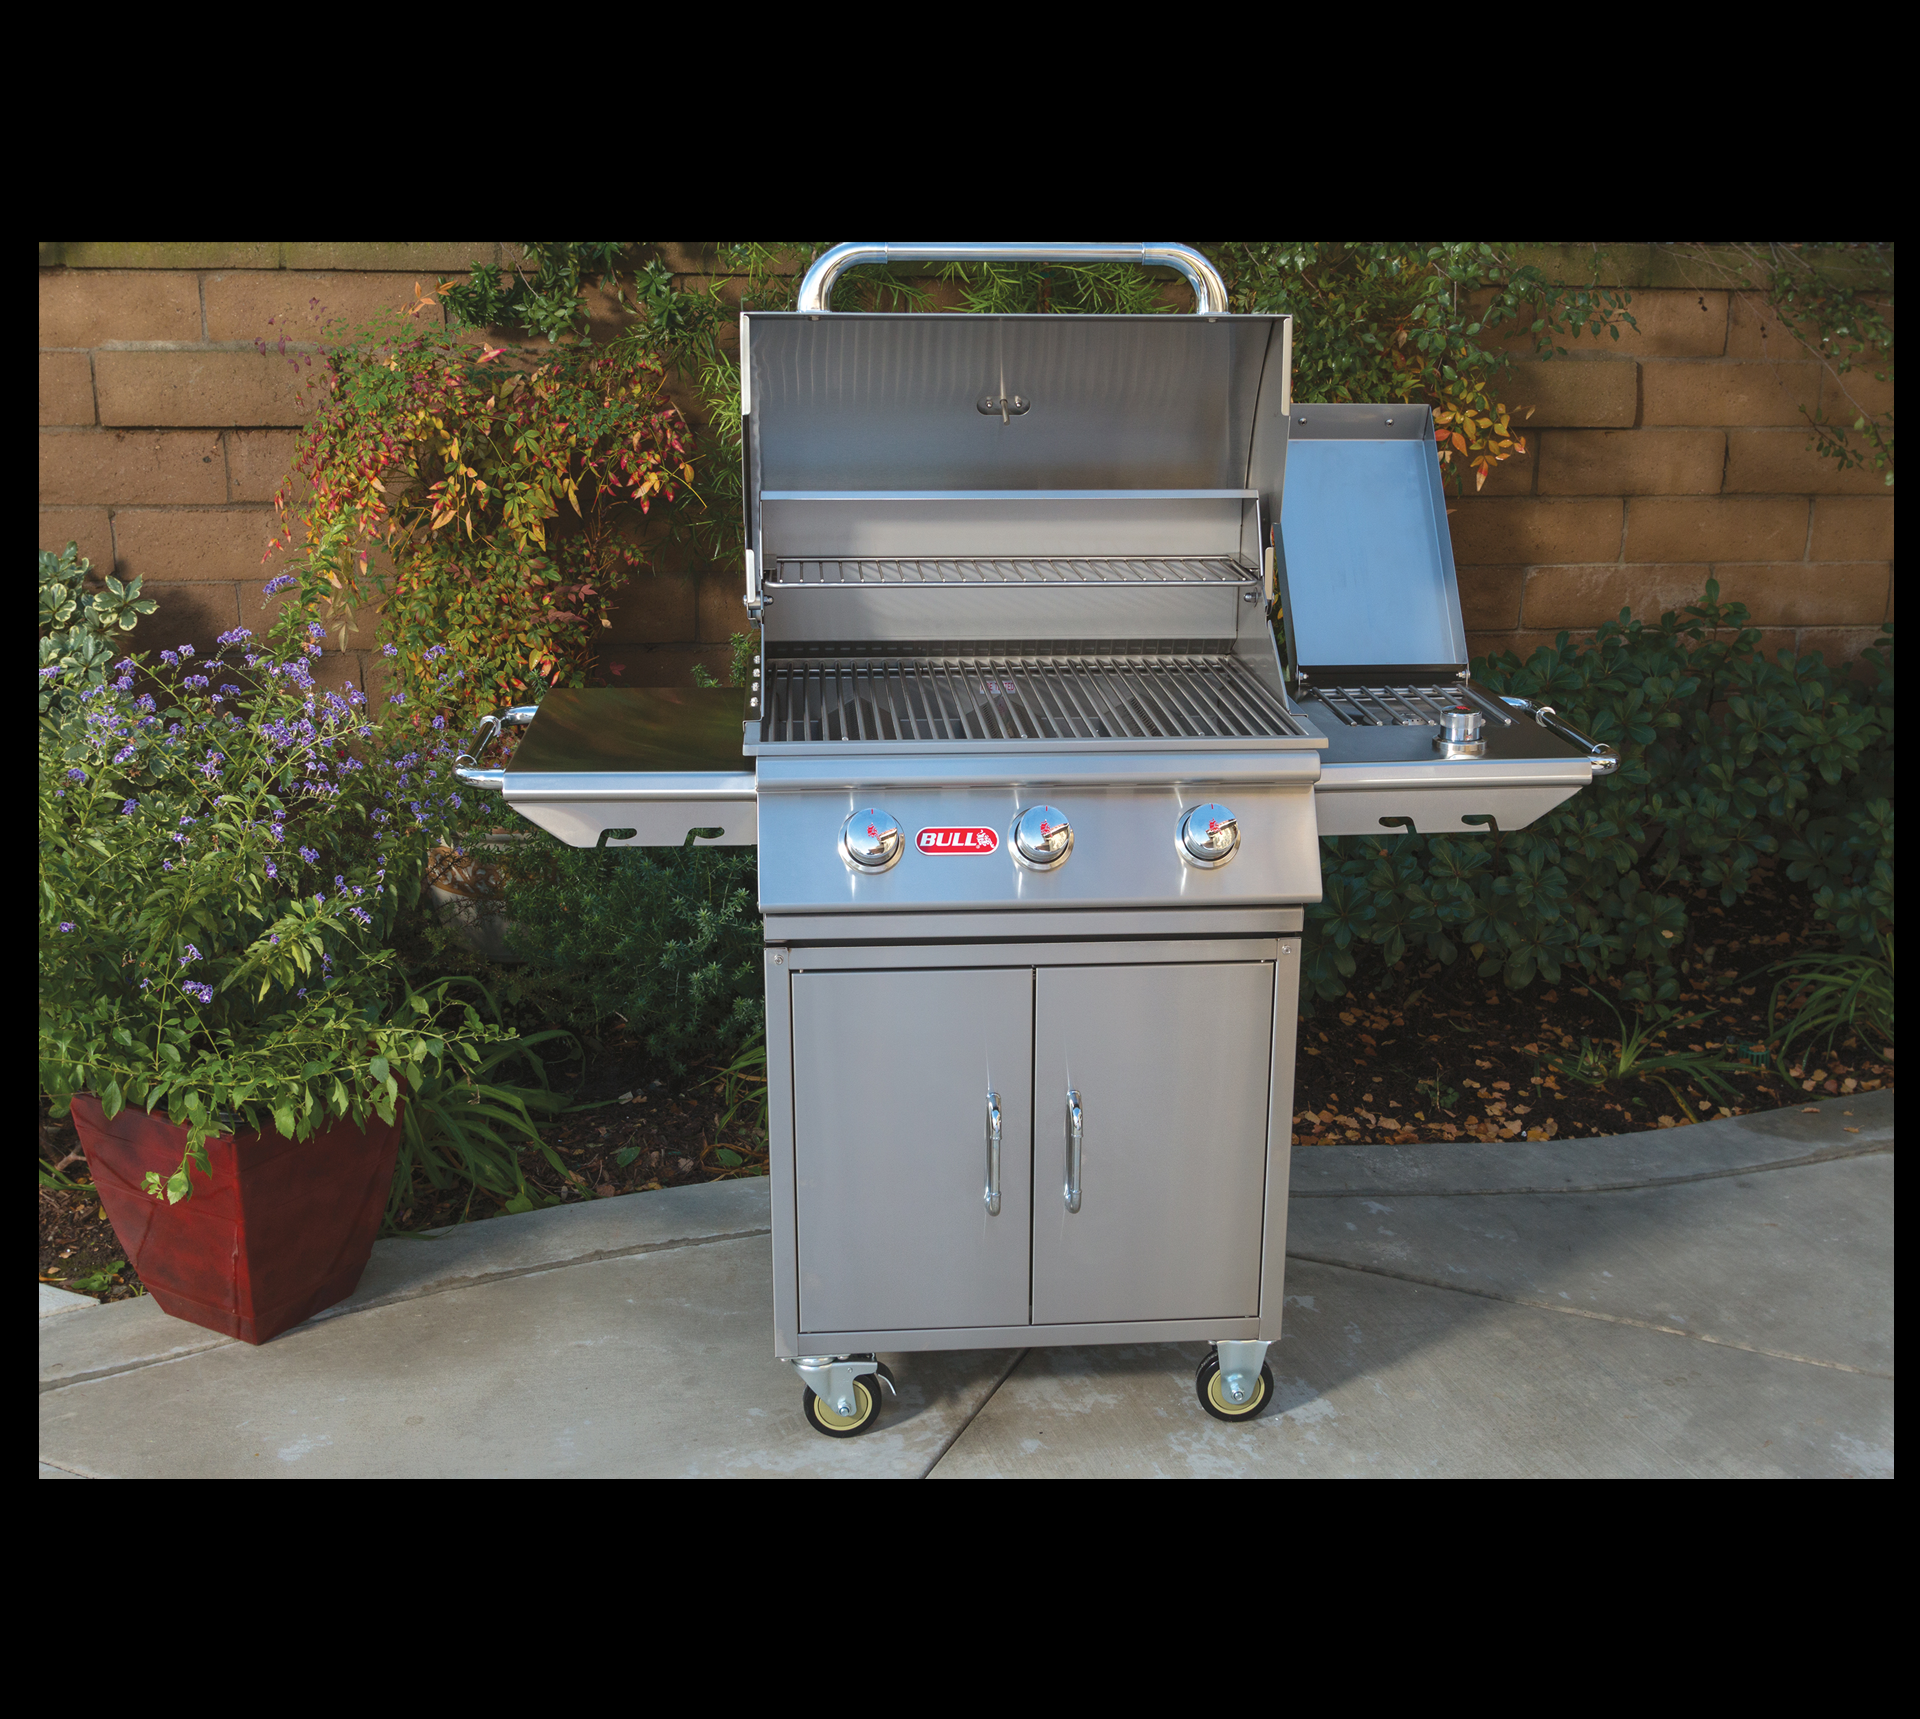 photo of grill with side kick shelf side burner